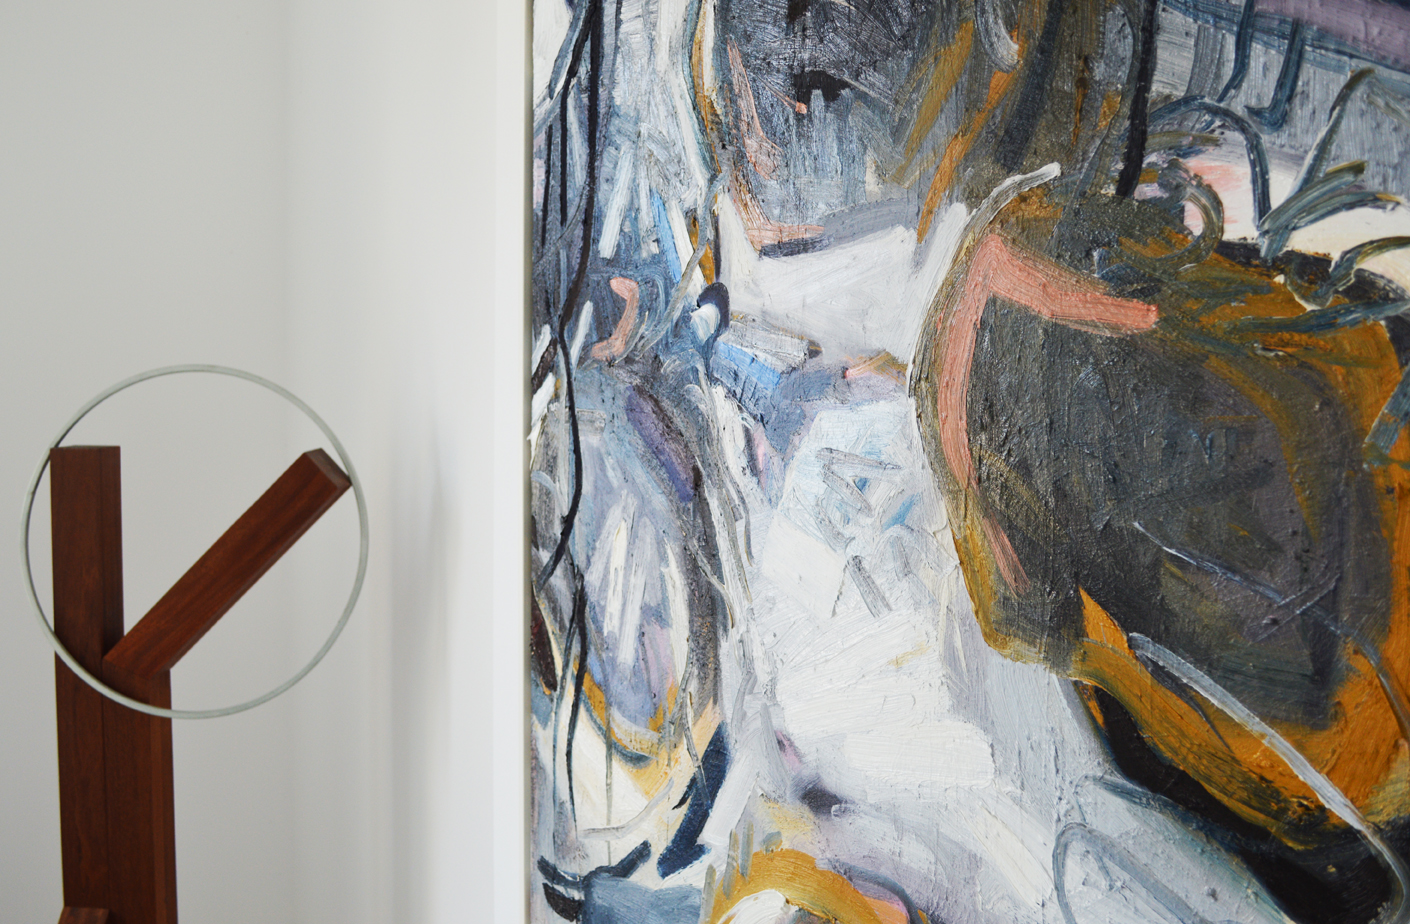 hansaviertel,  2017   acrylic on canvas  190 x 300cm  price on application